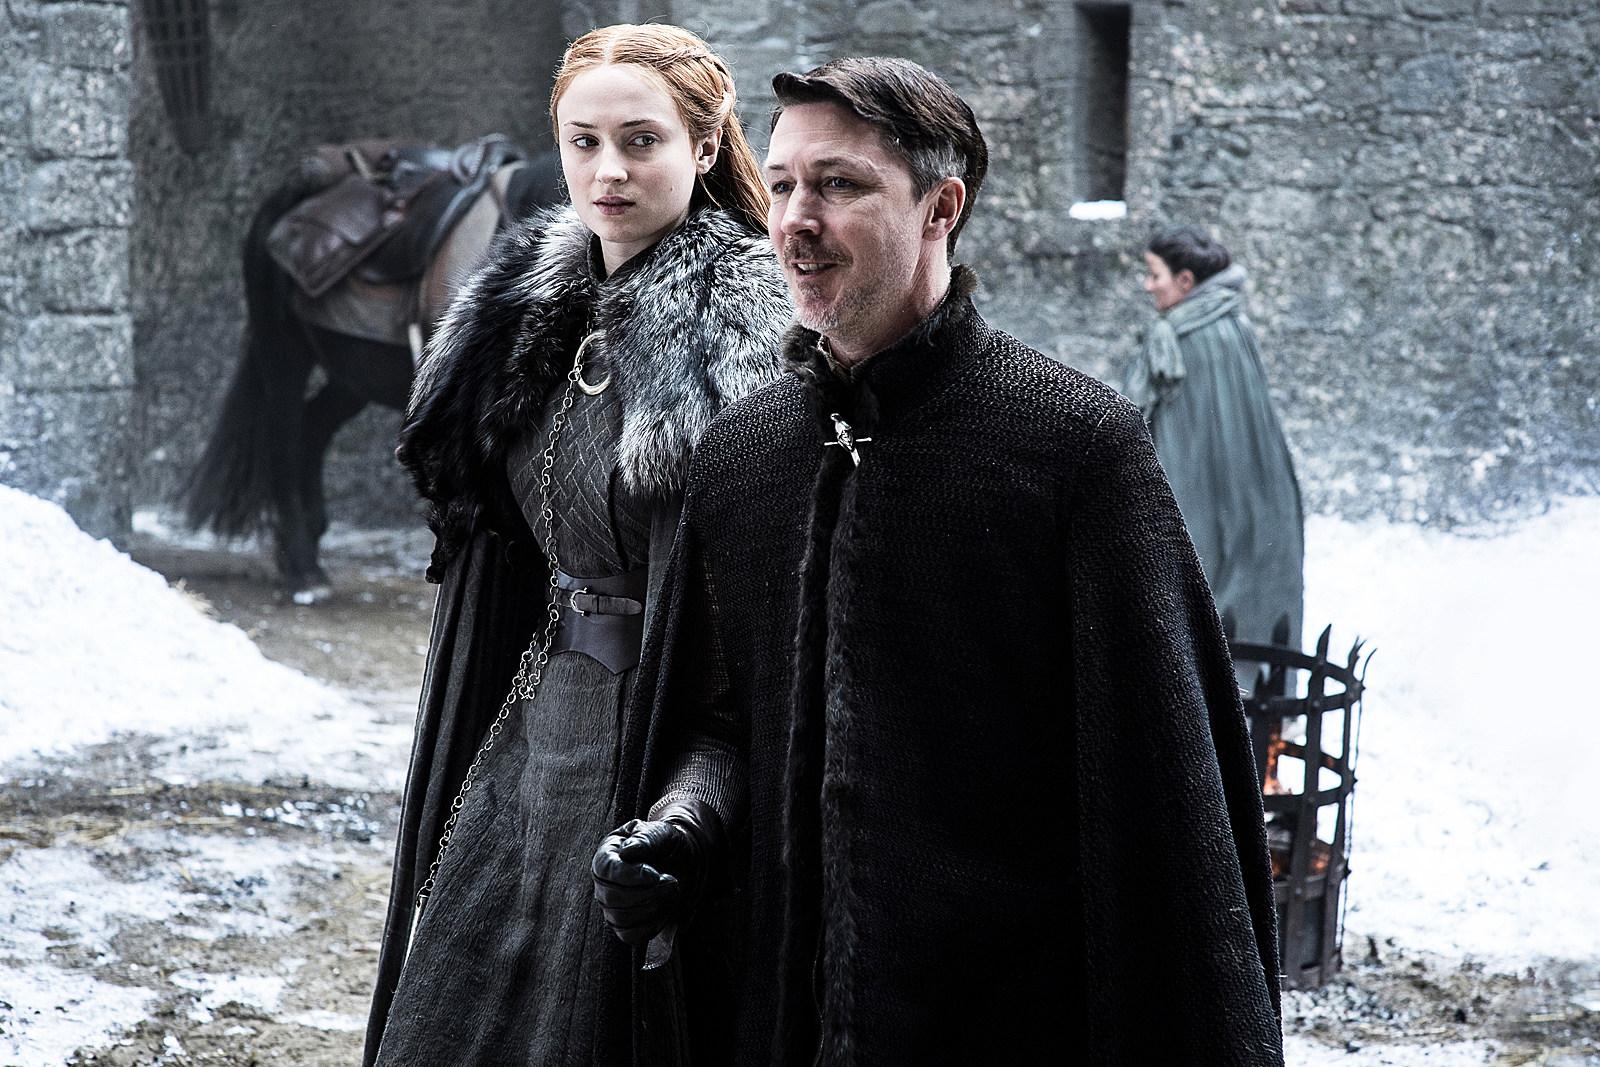 Game of Thrones Queens Justice Questions Littlefinger